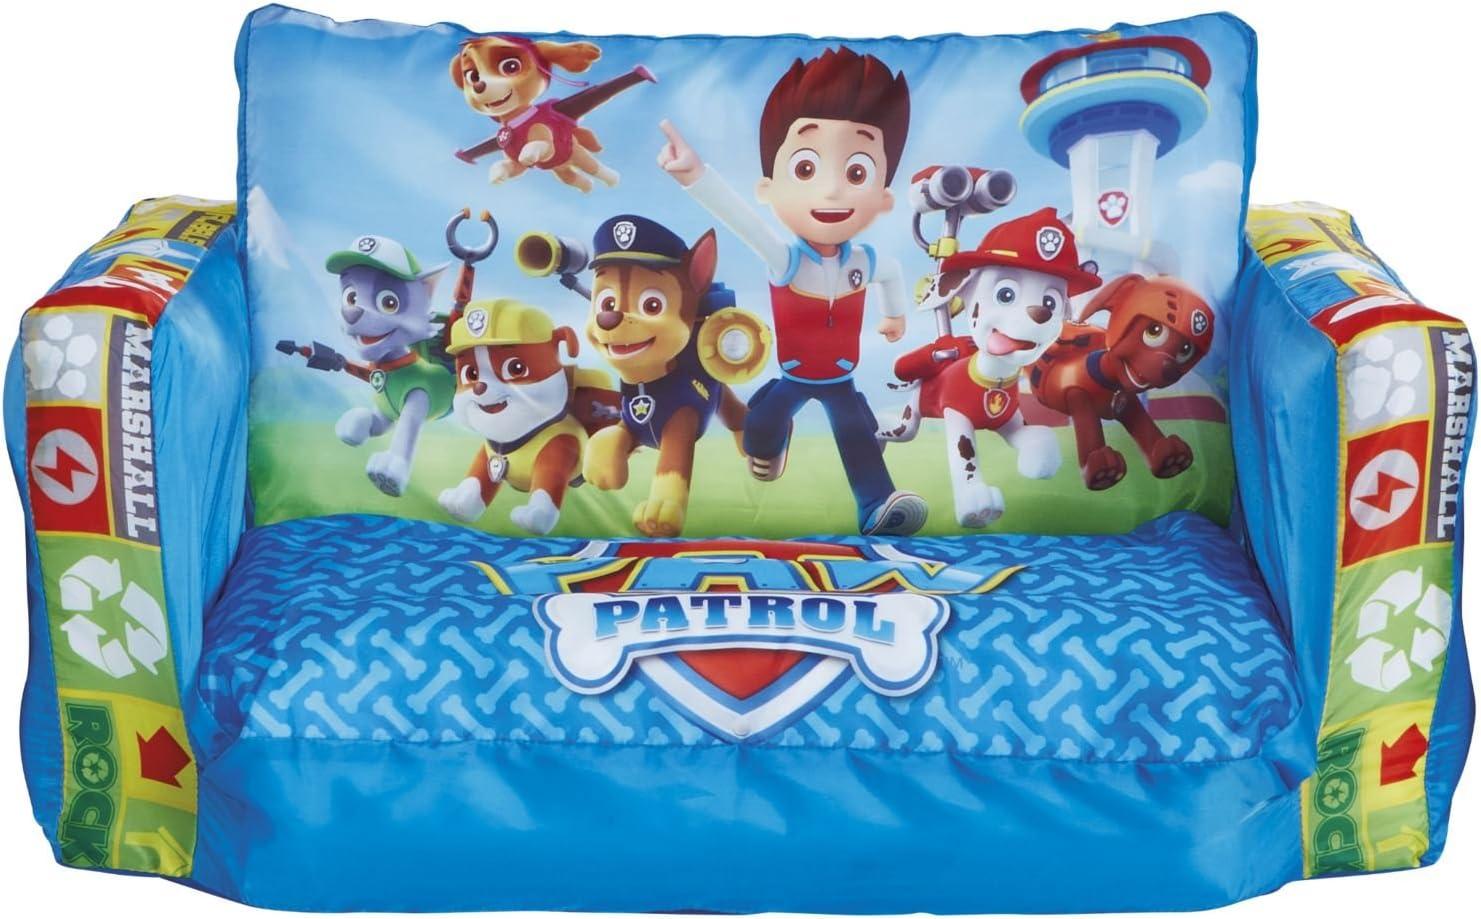 Paw Patrol 286PAW Mini sofá y Tumbona desplegable 2 en 1, Acrílico, Azul, 26.00x68.00x105.00 cm